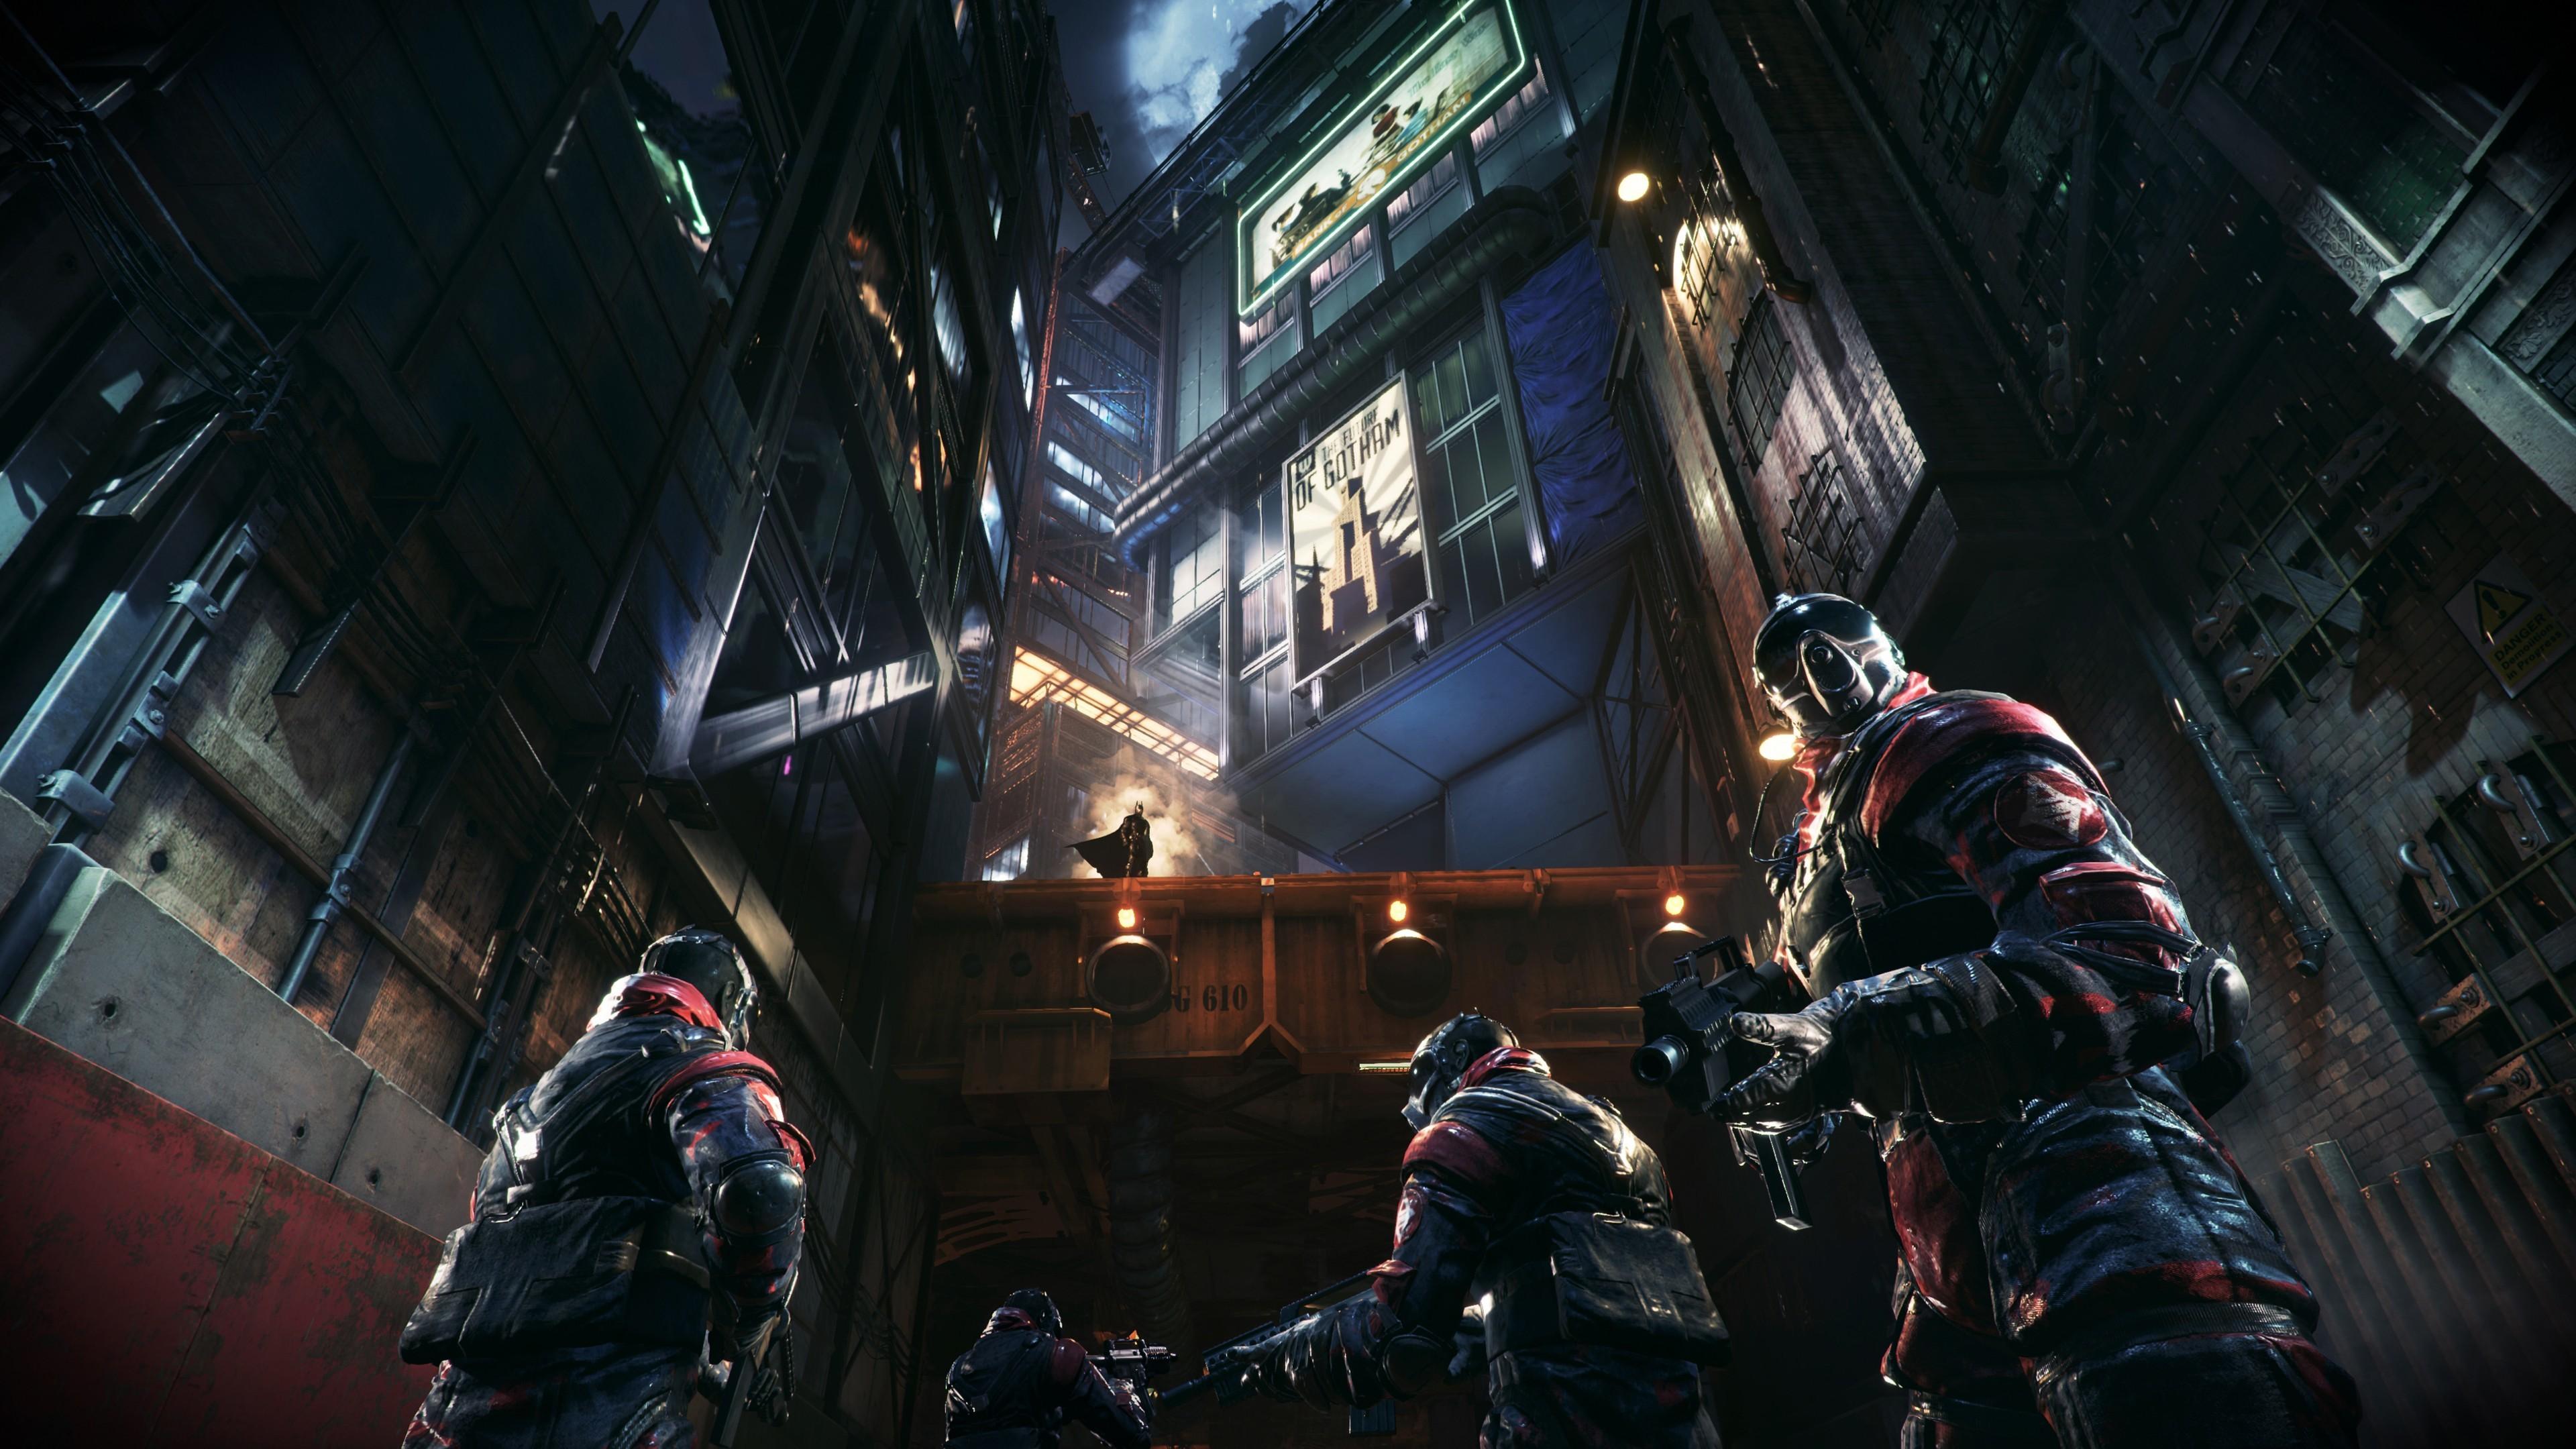 Video Game – Batman: Arkham Knight Wallpaper